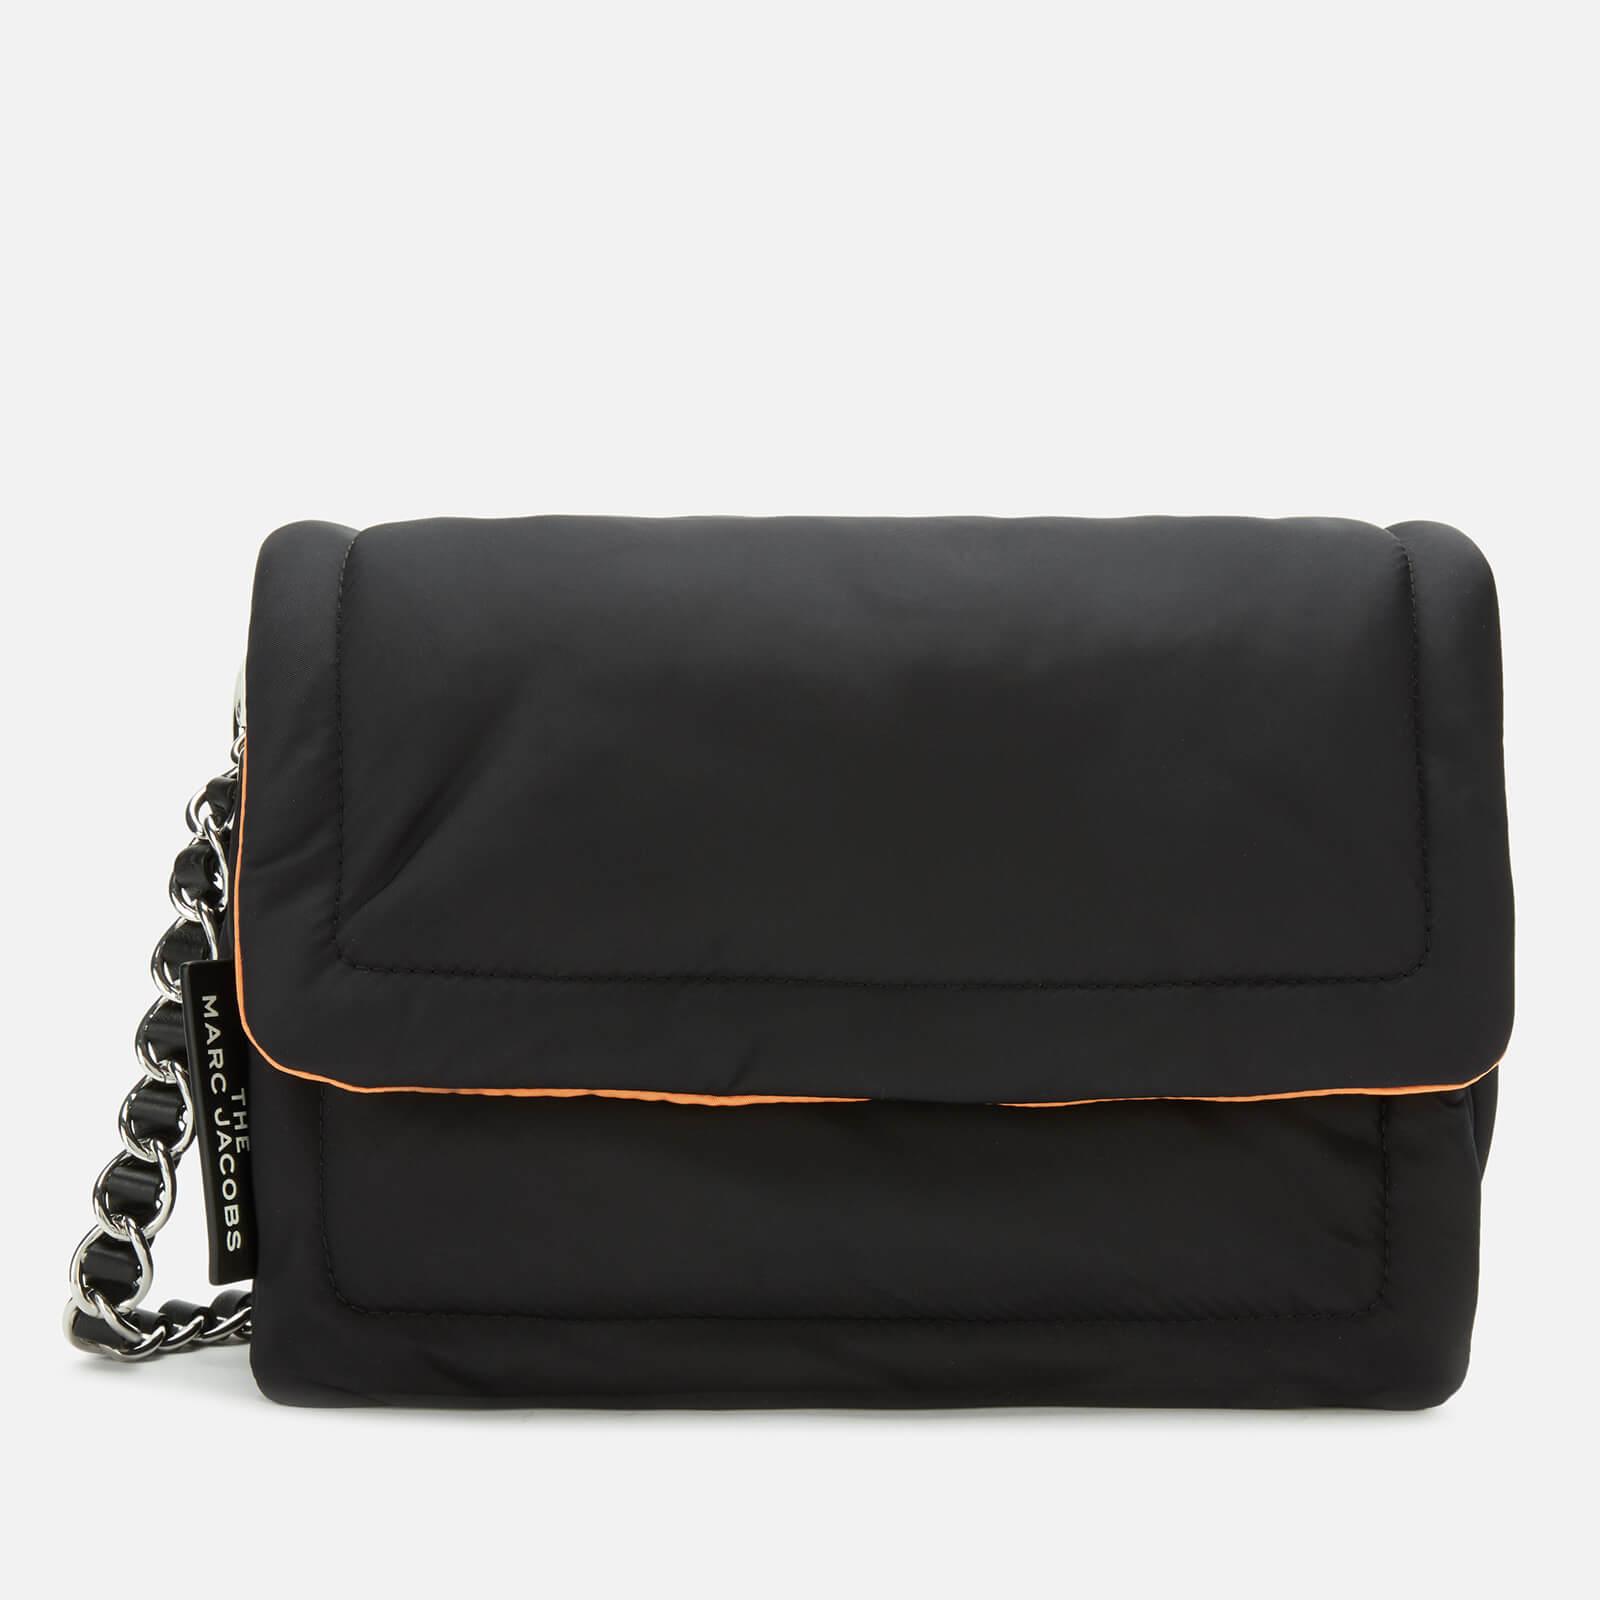 Marc Jacobs Women's The Nylon Pillow Bag - Black